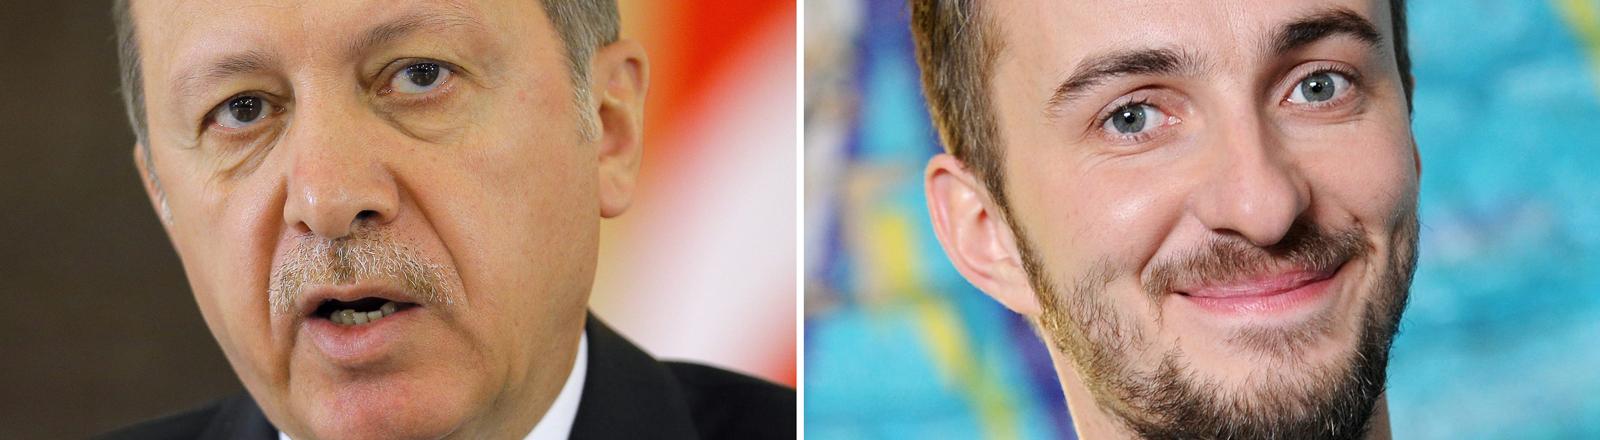 Recep Tayyip Erdoğan und Jan Böhmermann